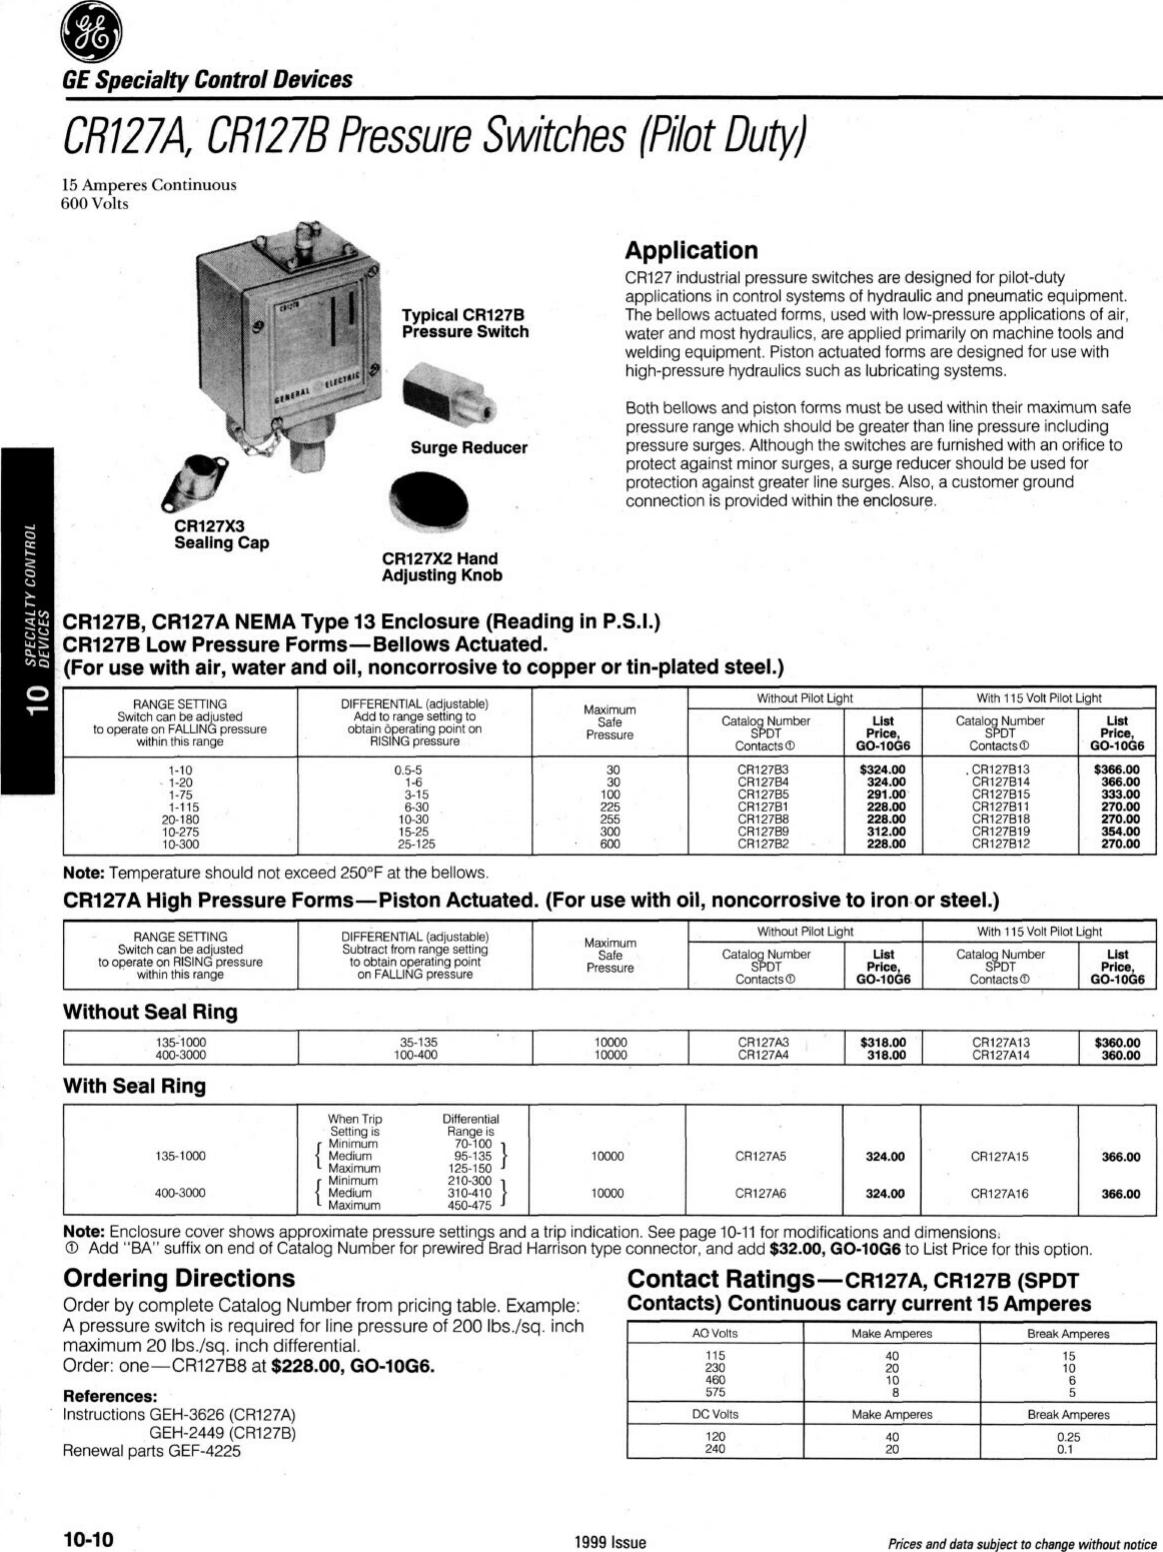 GE CR127B4 Pressure Switch.